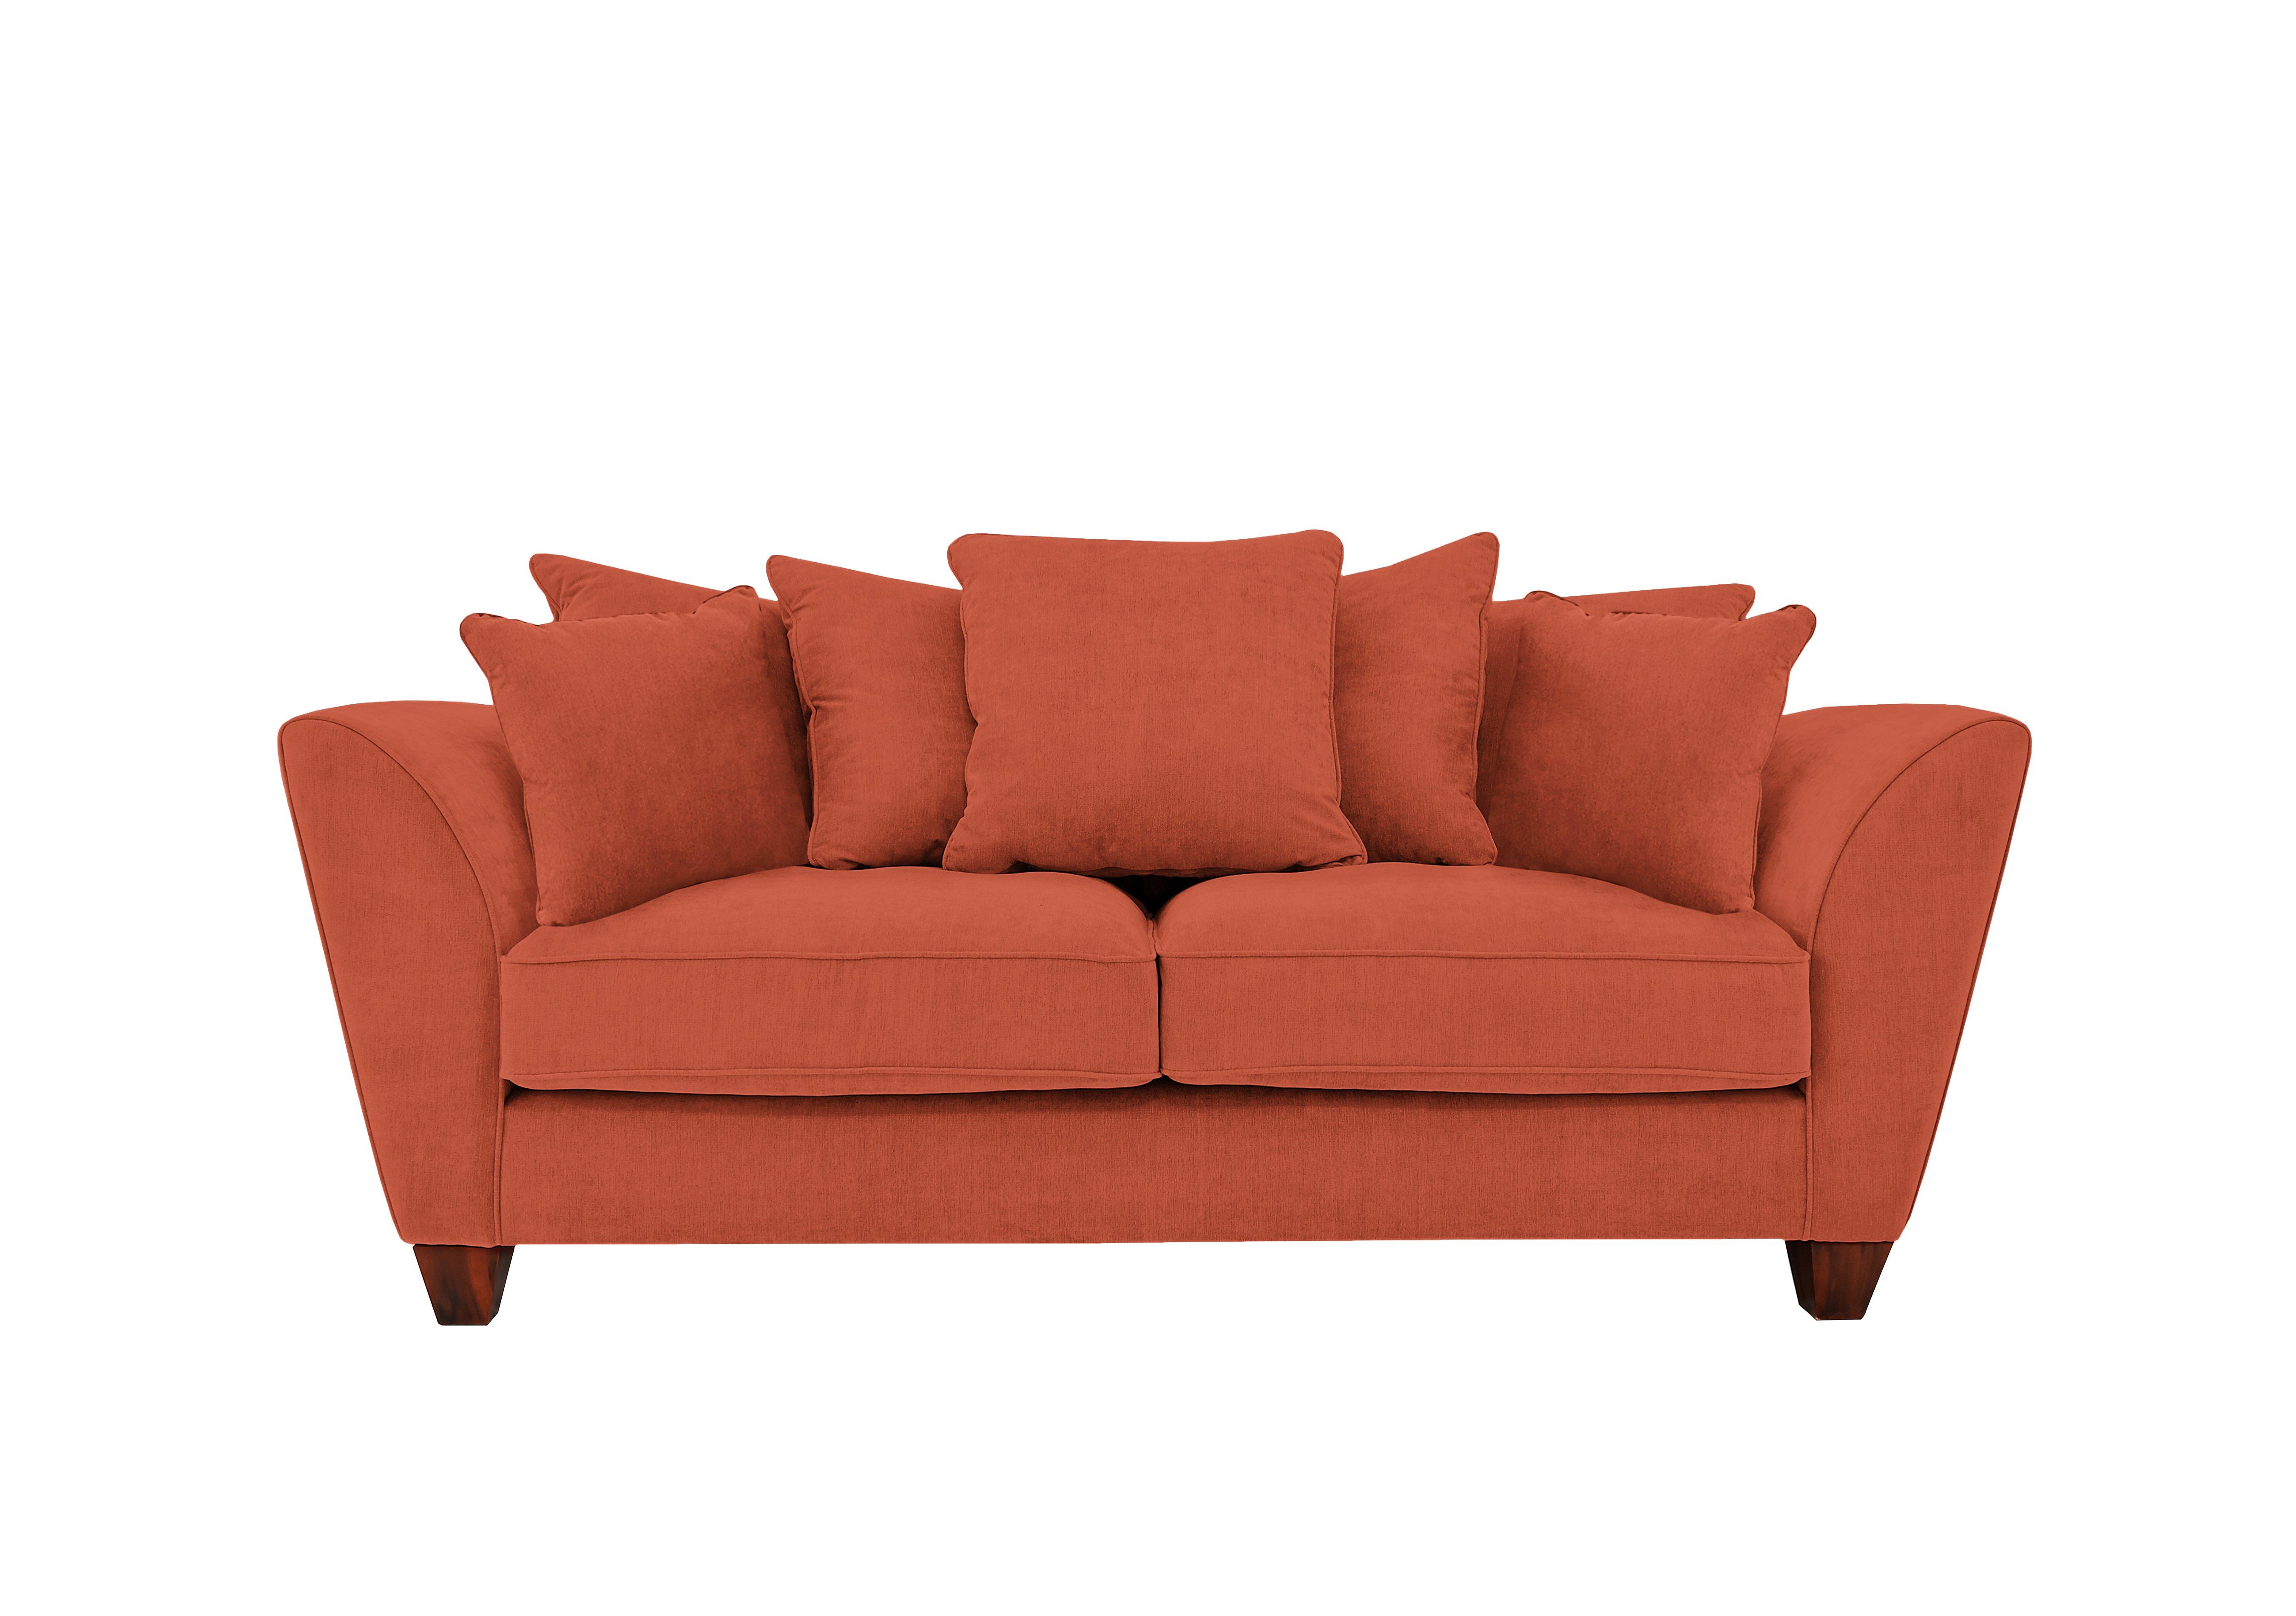 Magnificent 25 Sofa Furniture Inspiration Design Avenger Power